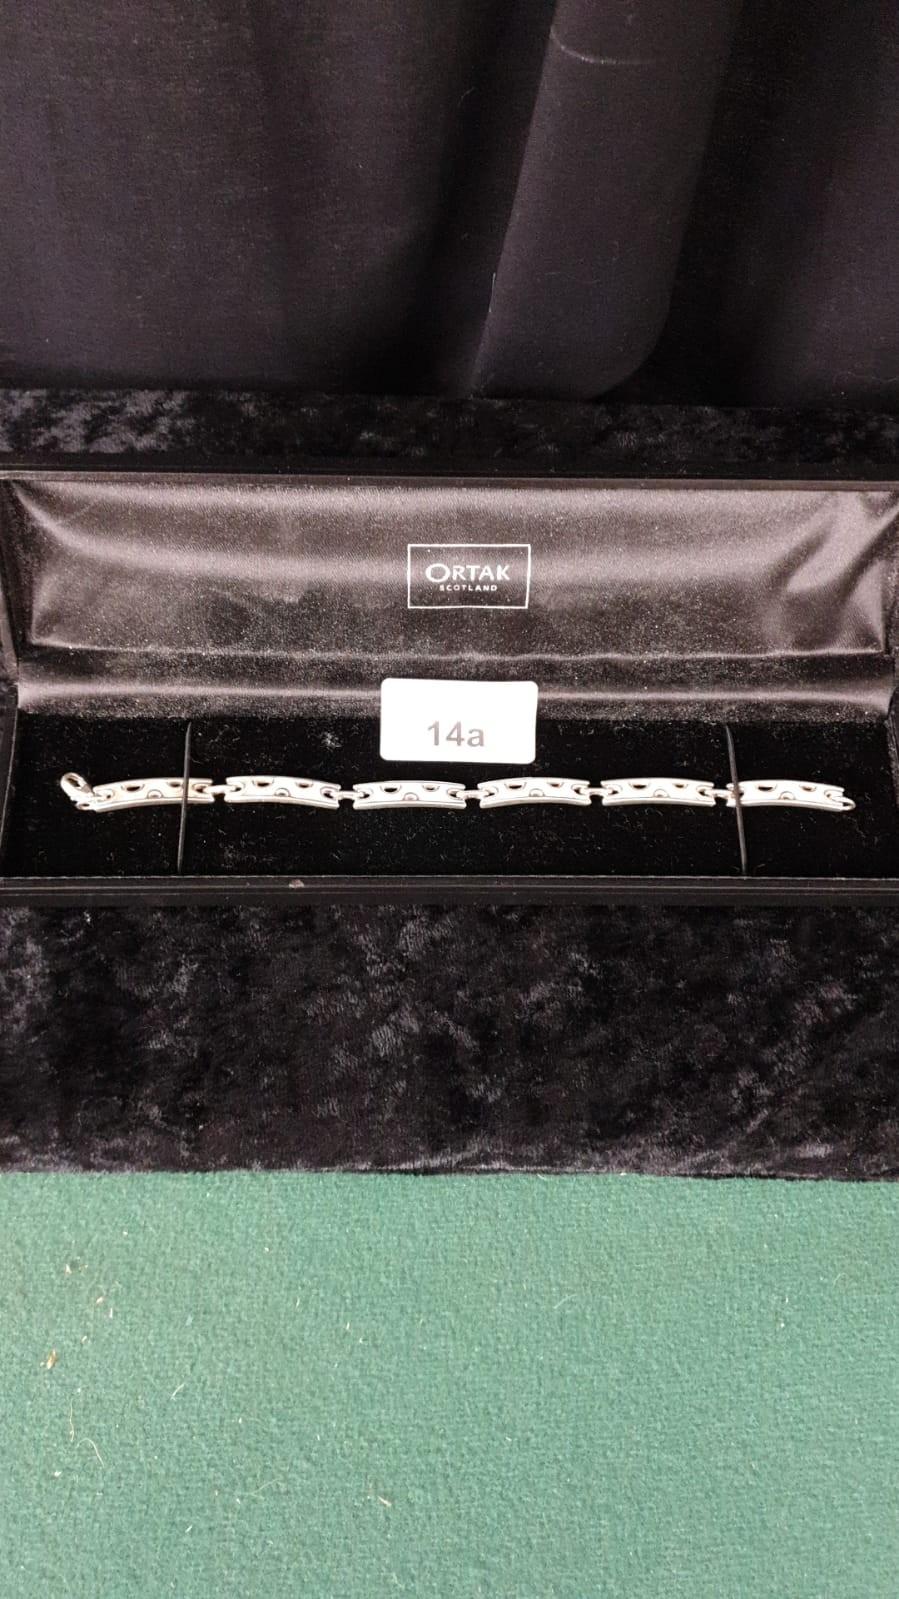 Ortak silver heavy Celtic bracelet . 7.5 inches long .